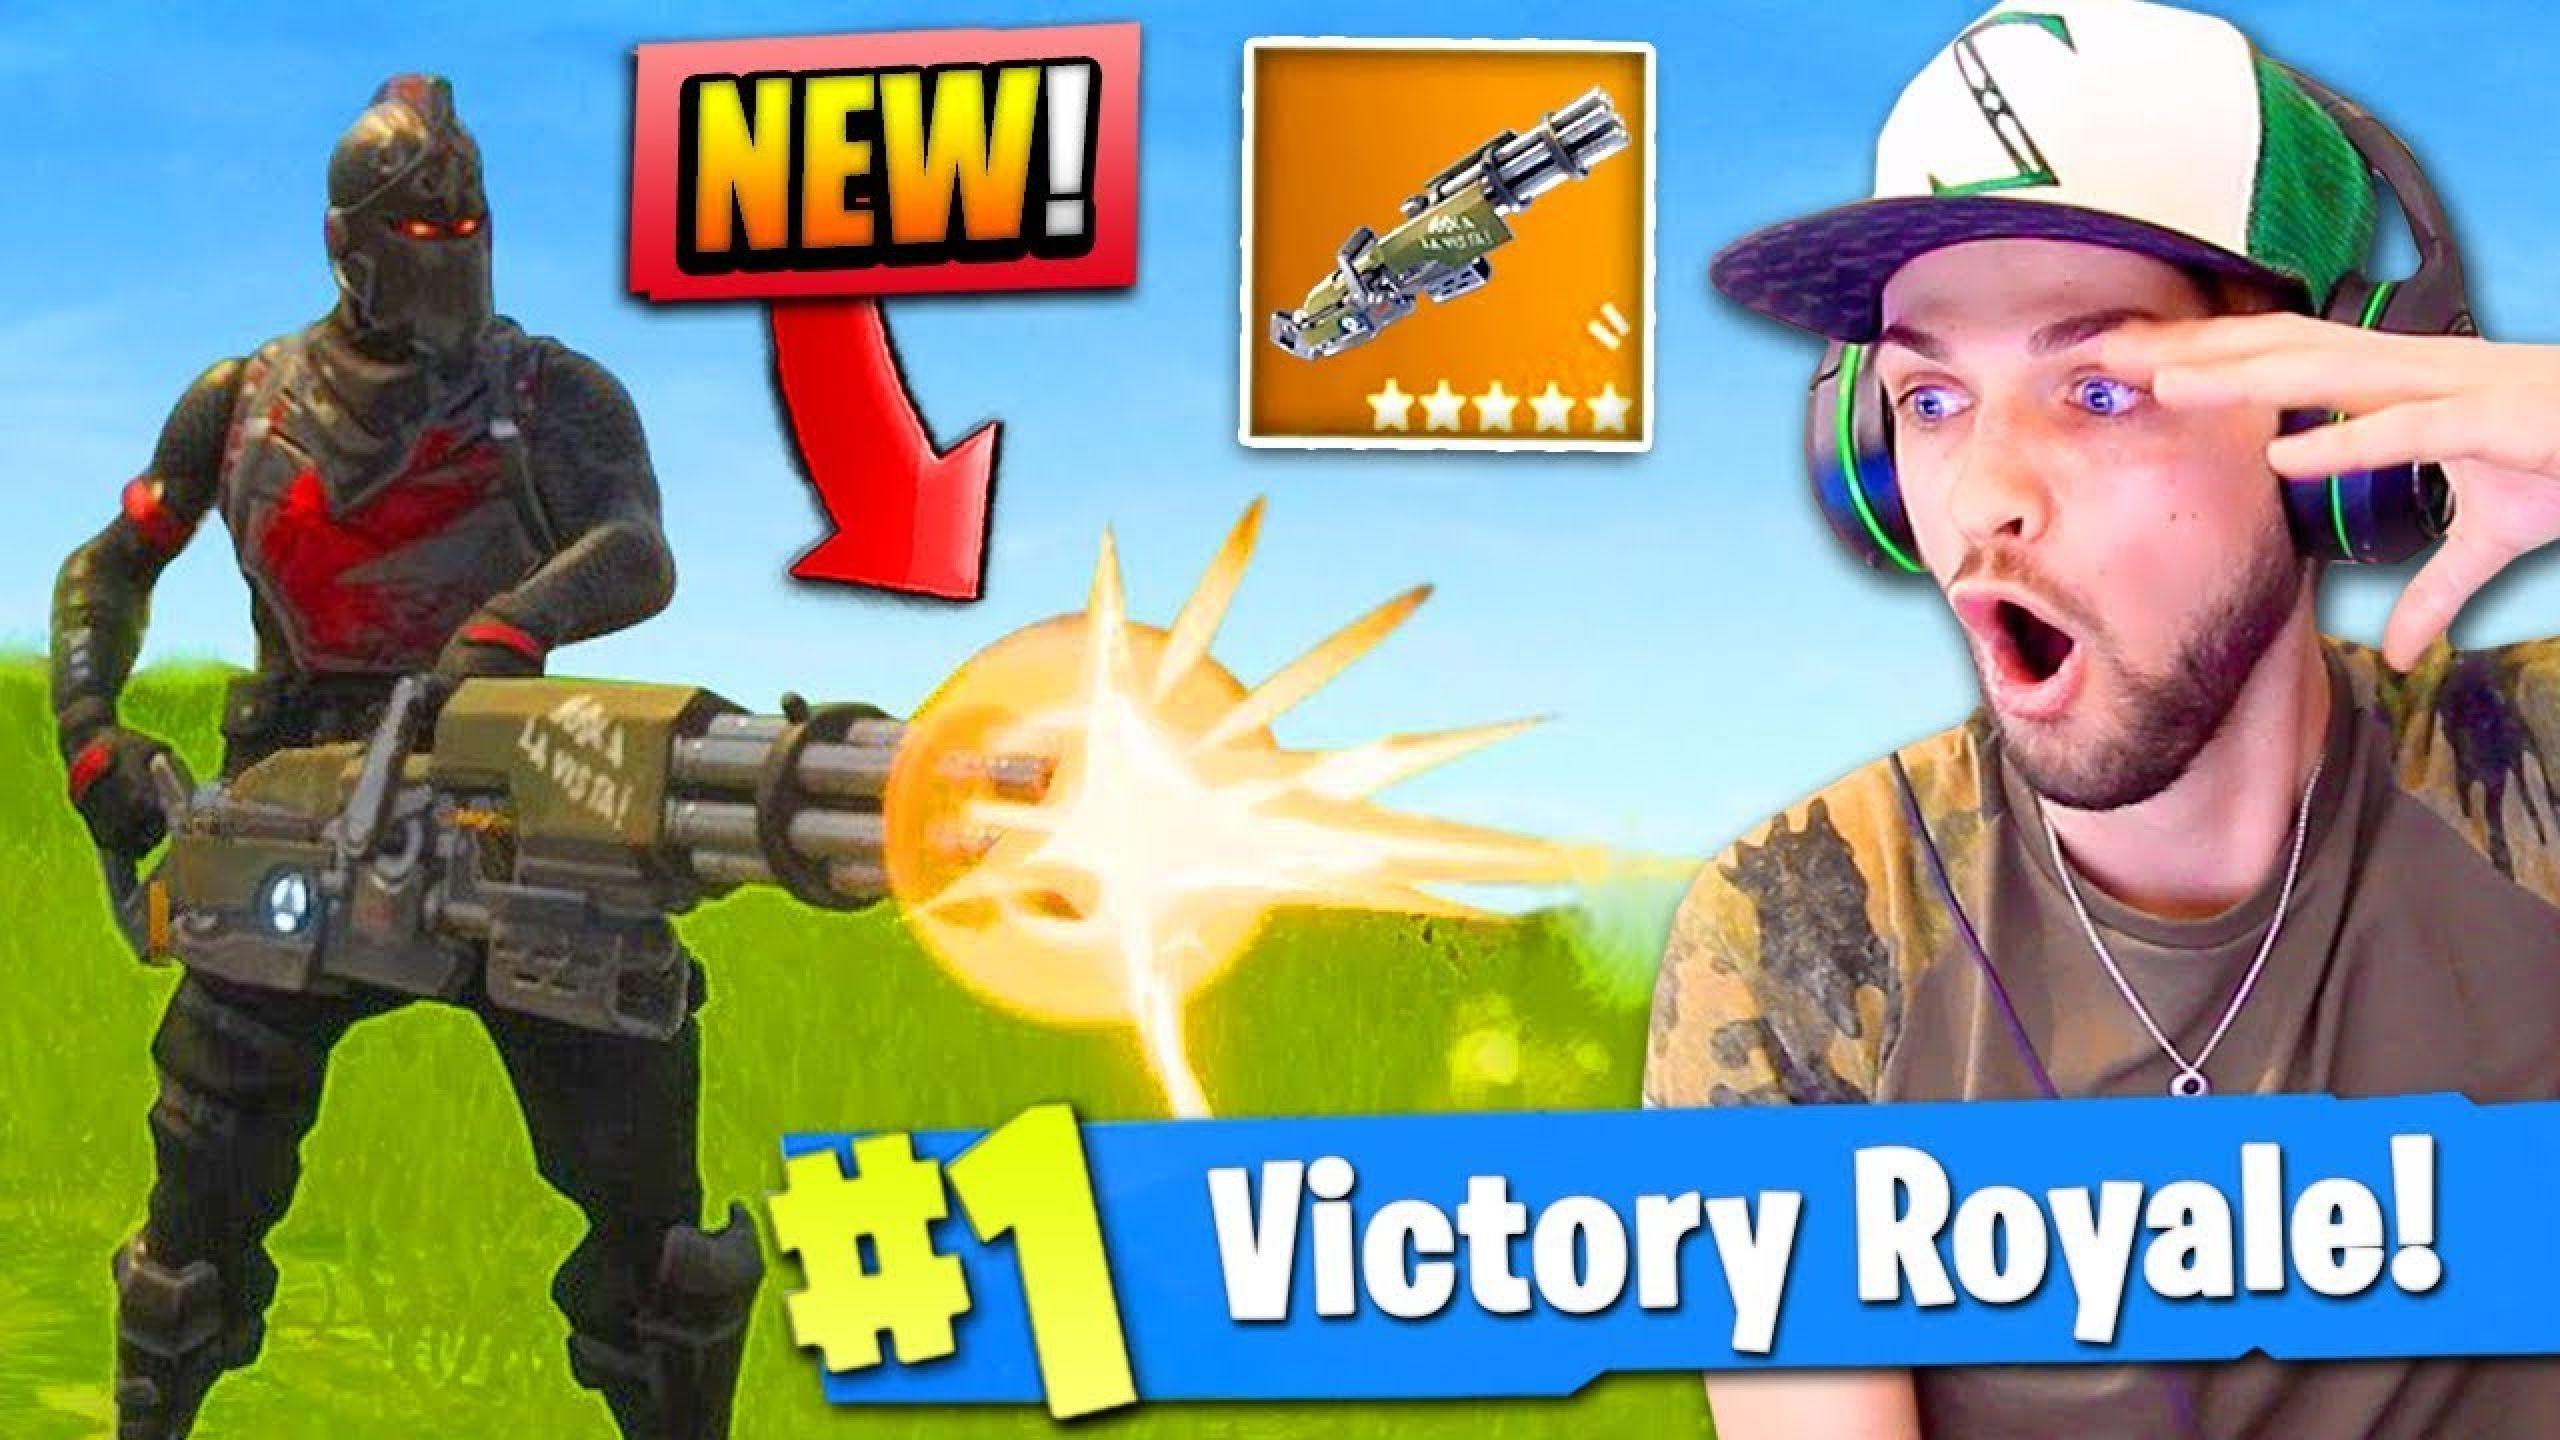 New Mini Gun Gameplay In Fortnite Battle Royale